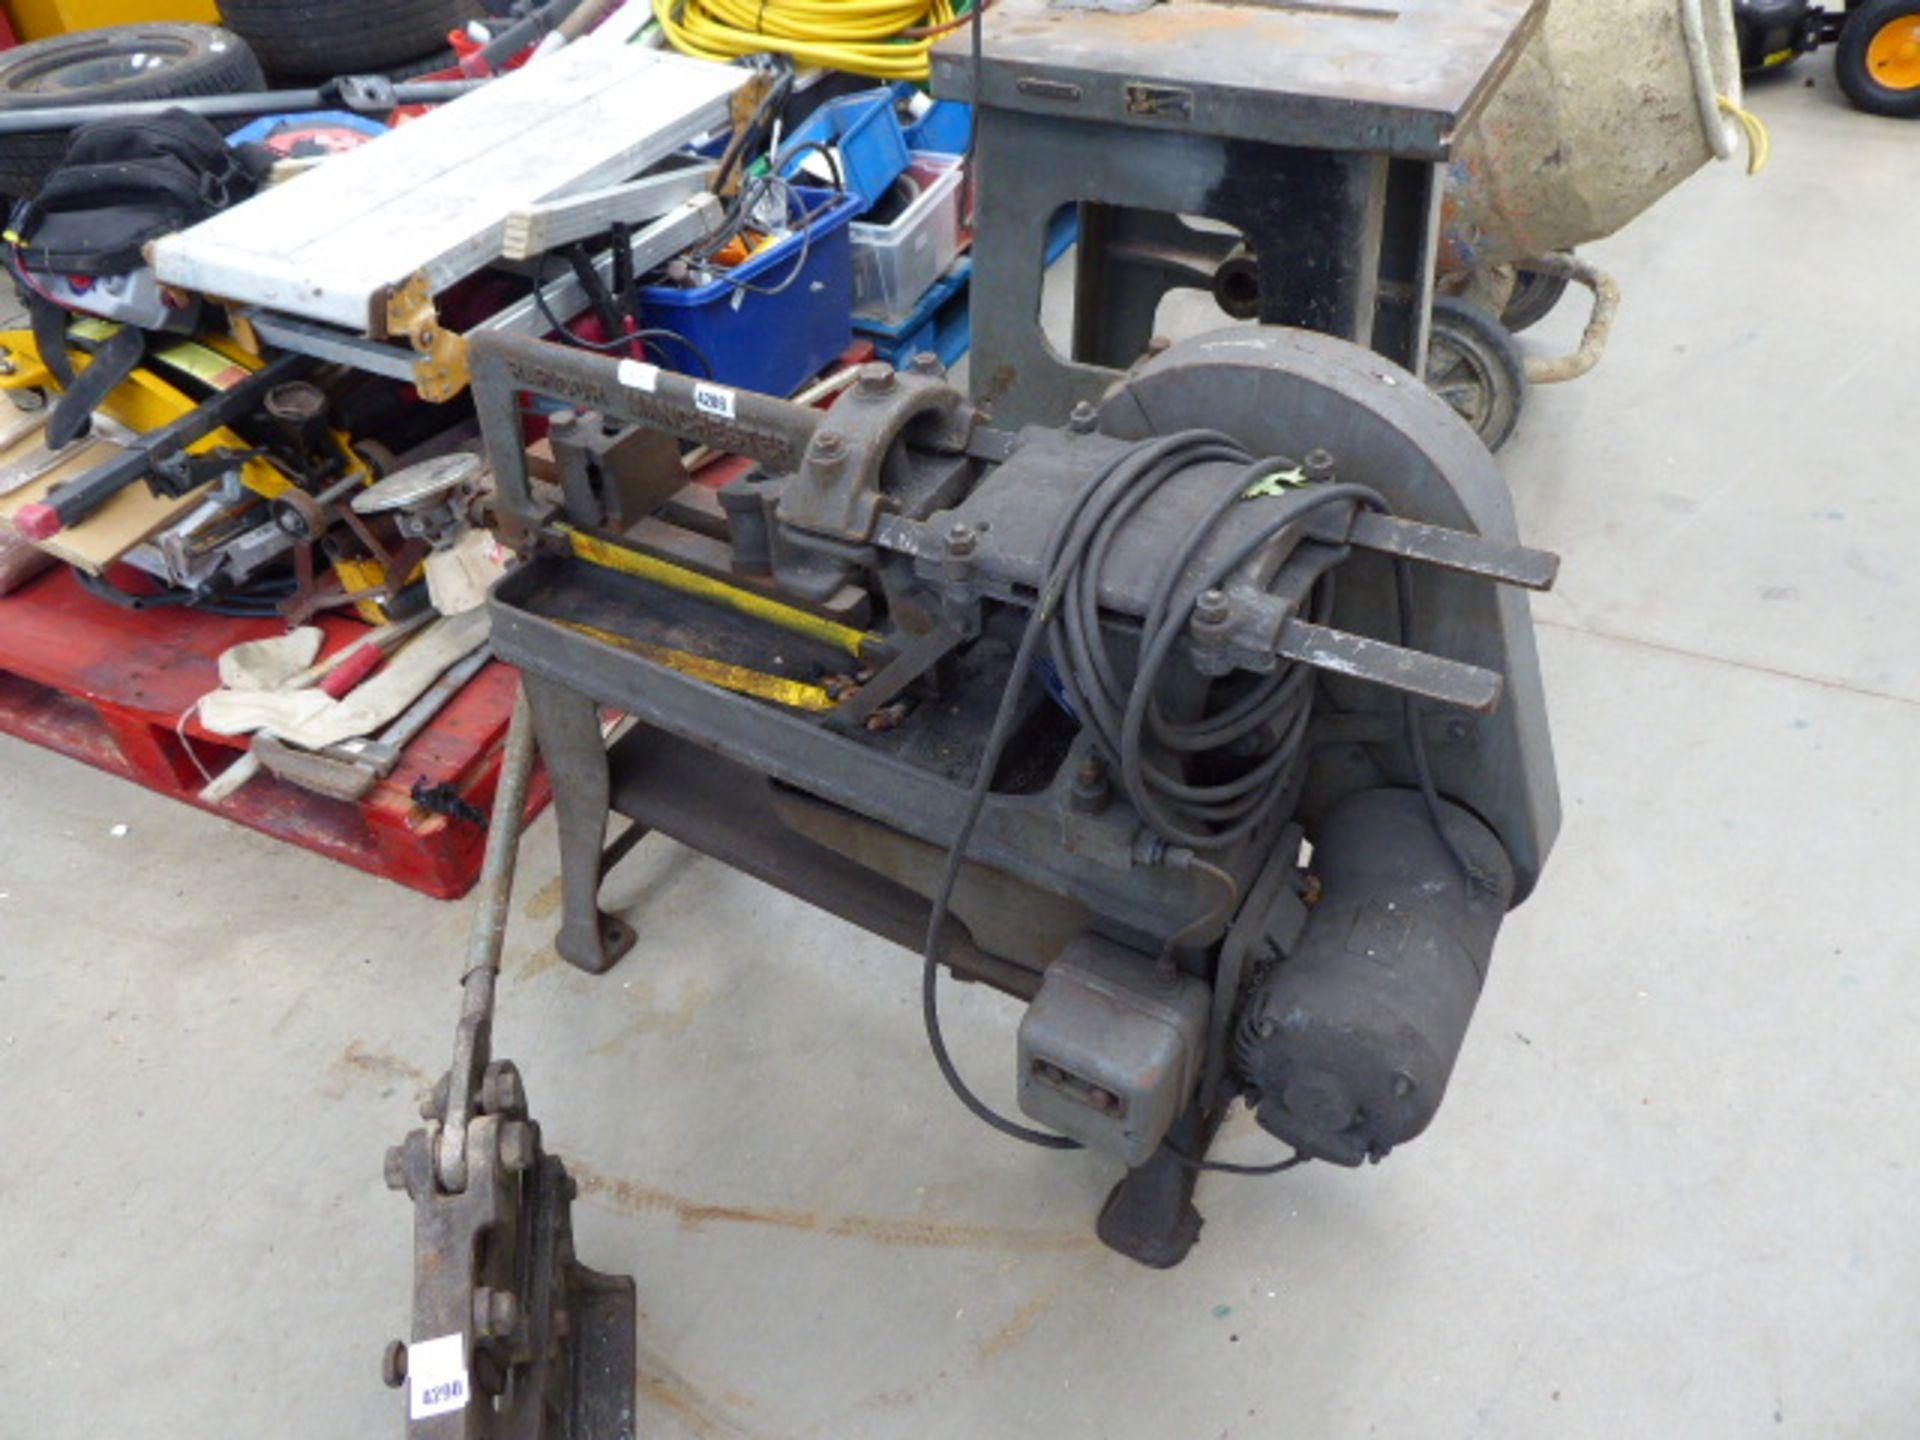 Lot 4289 - Large electric powered hacksaw